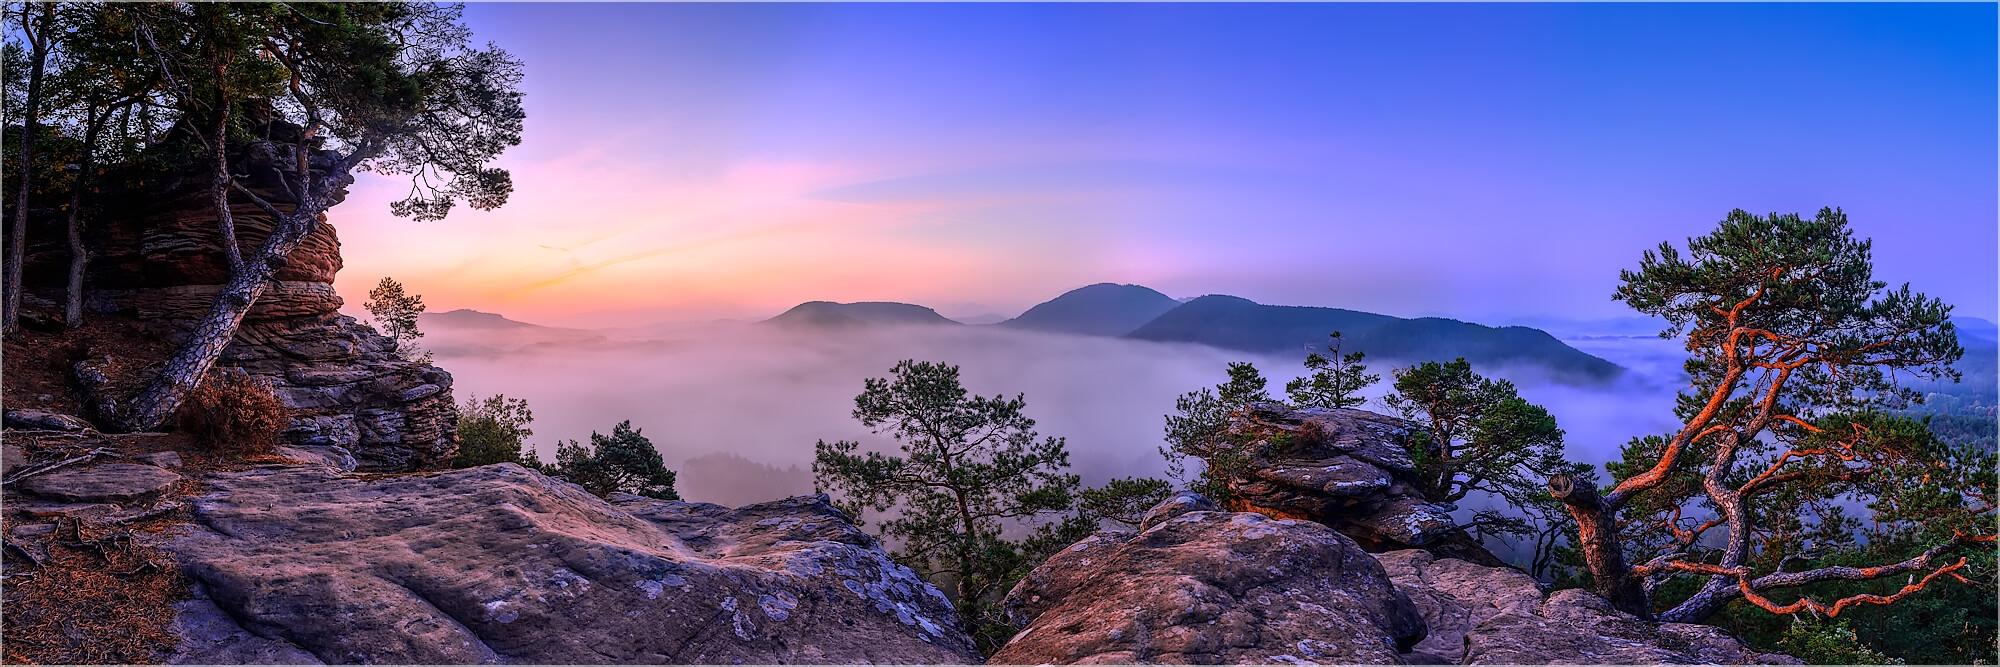 Panoramabild morgens im Pfälzerwald